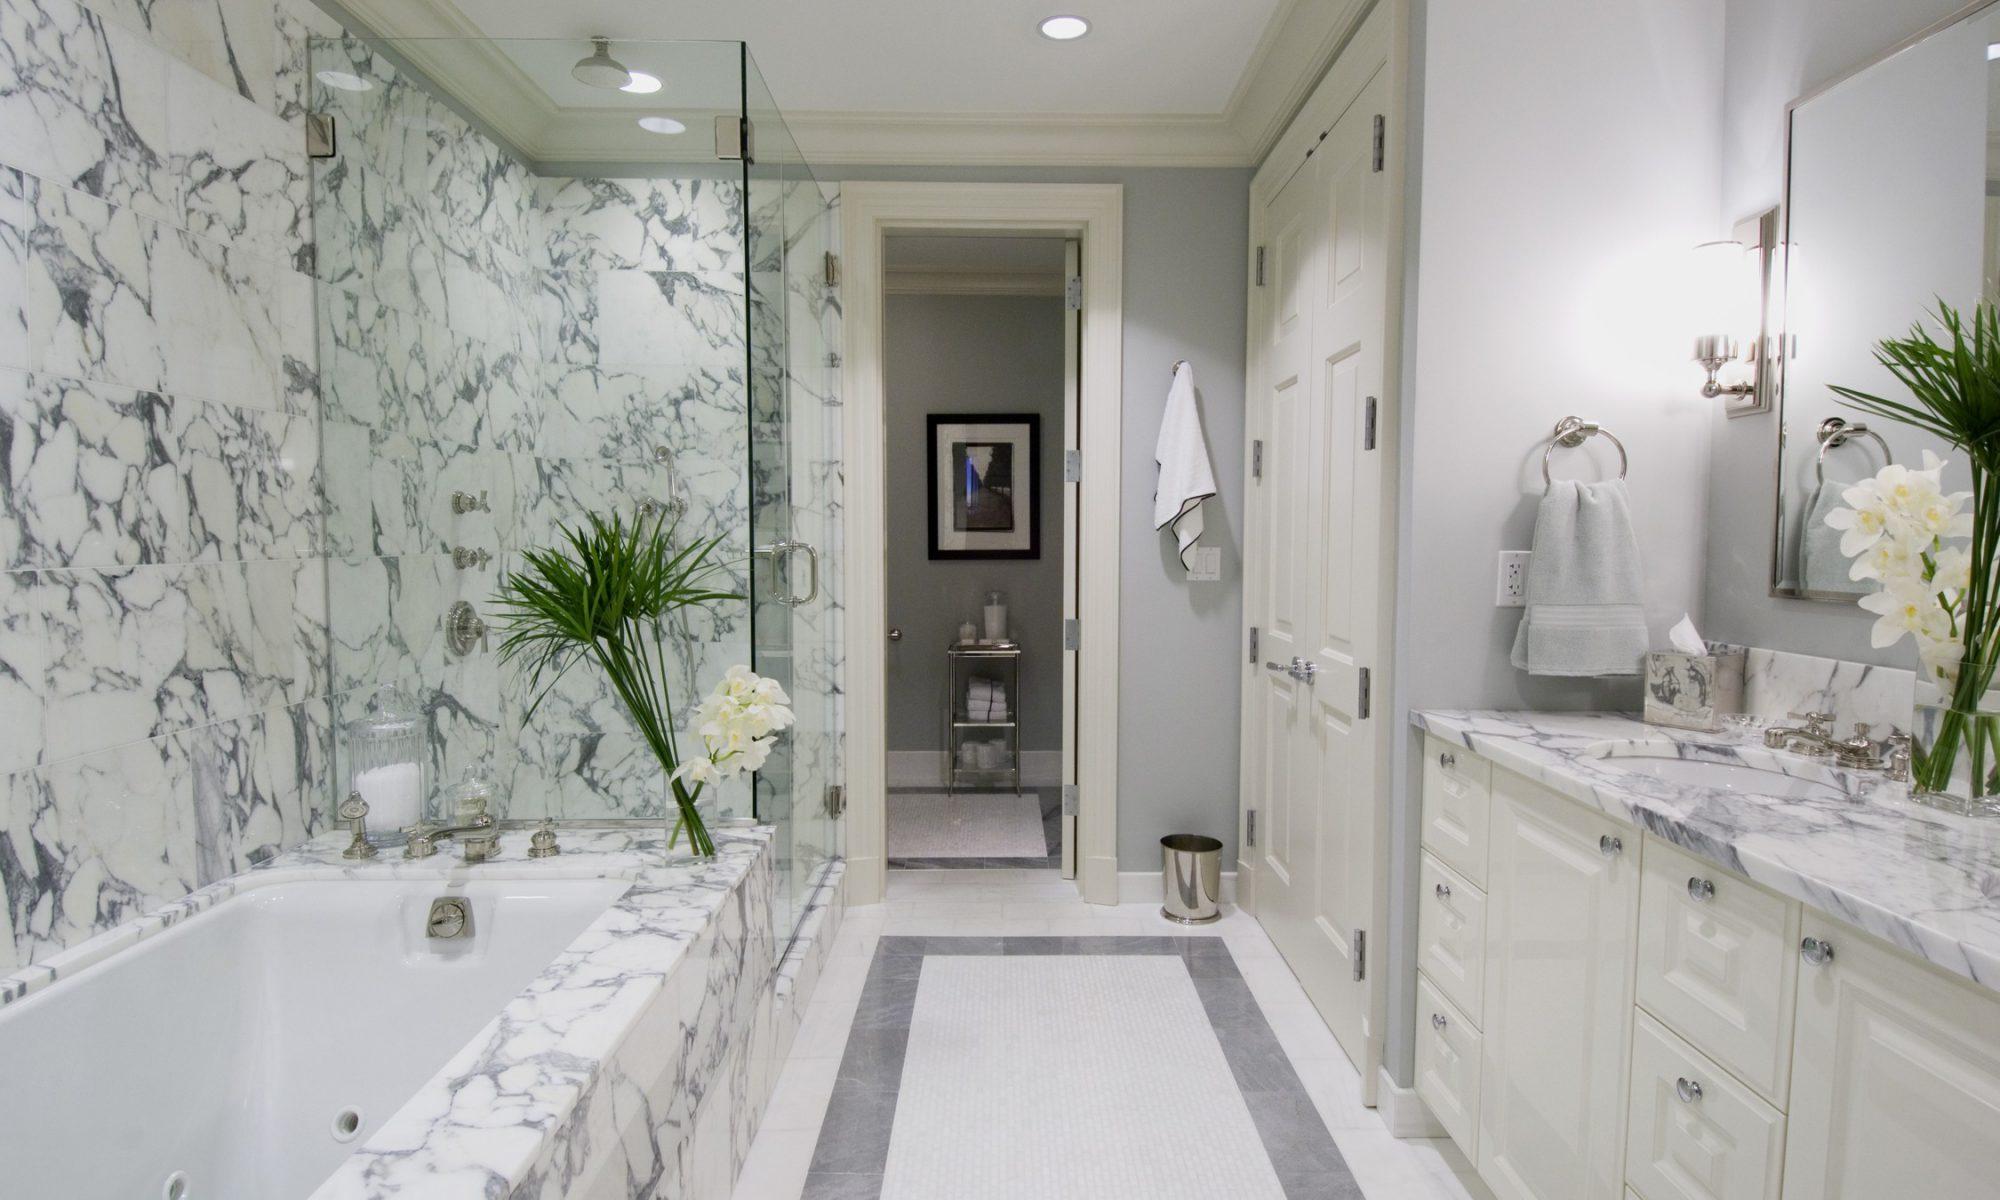 professional-tile-installation